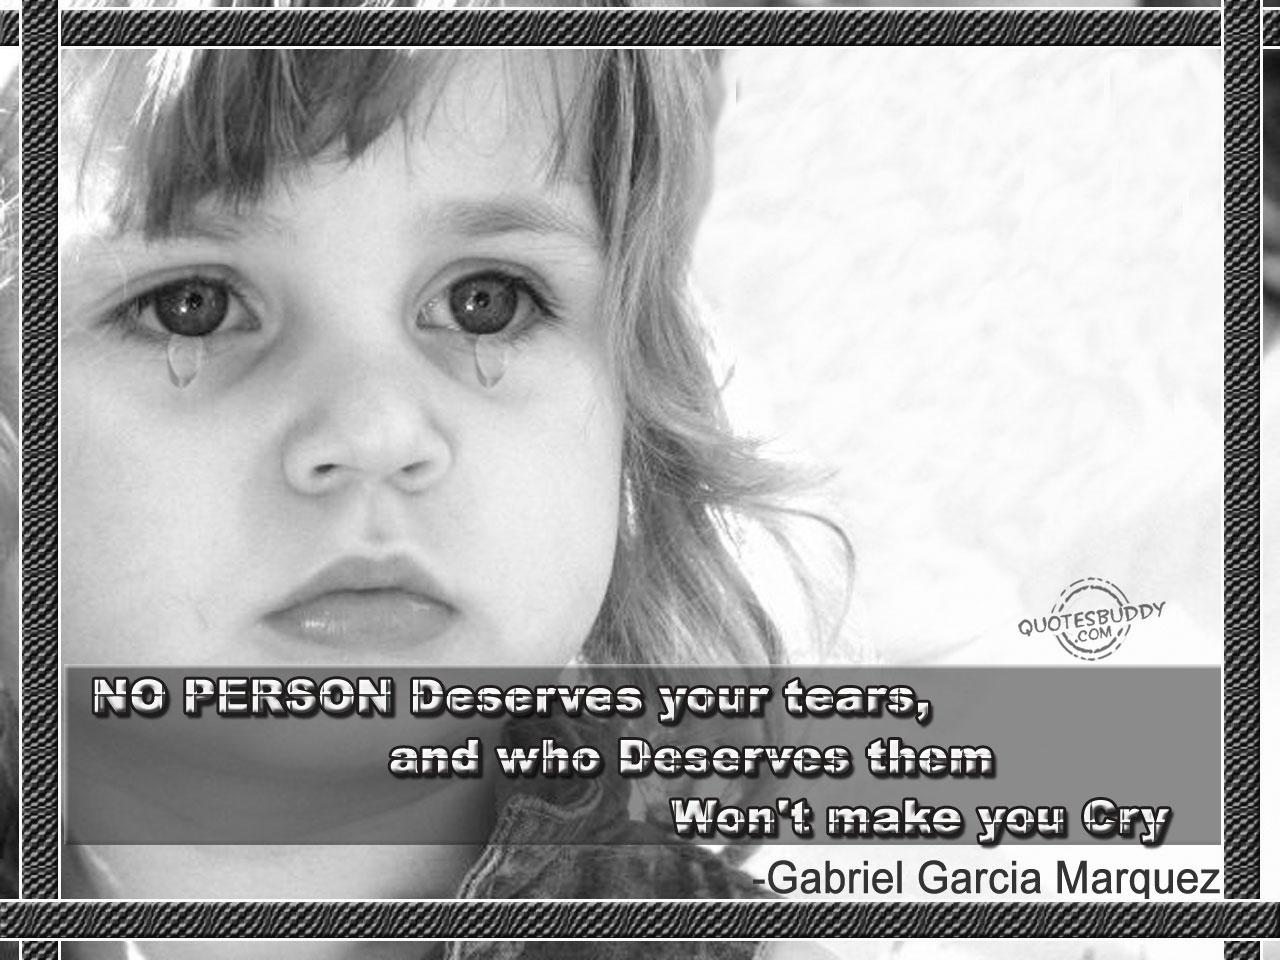 Gabriel Garcia Marquez's quote #1